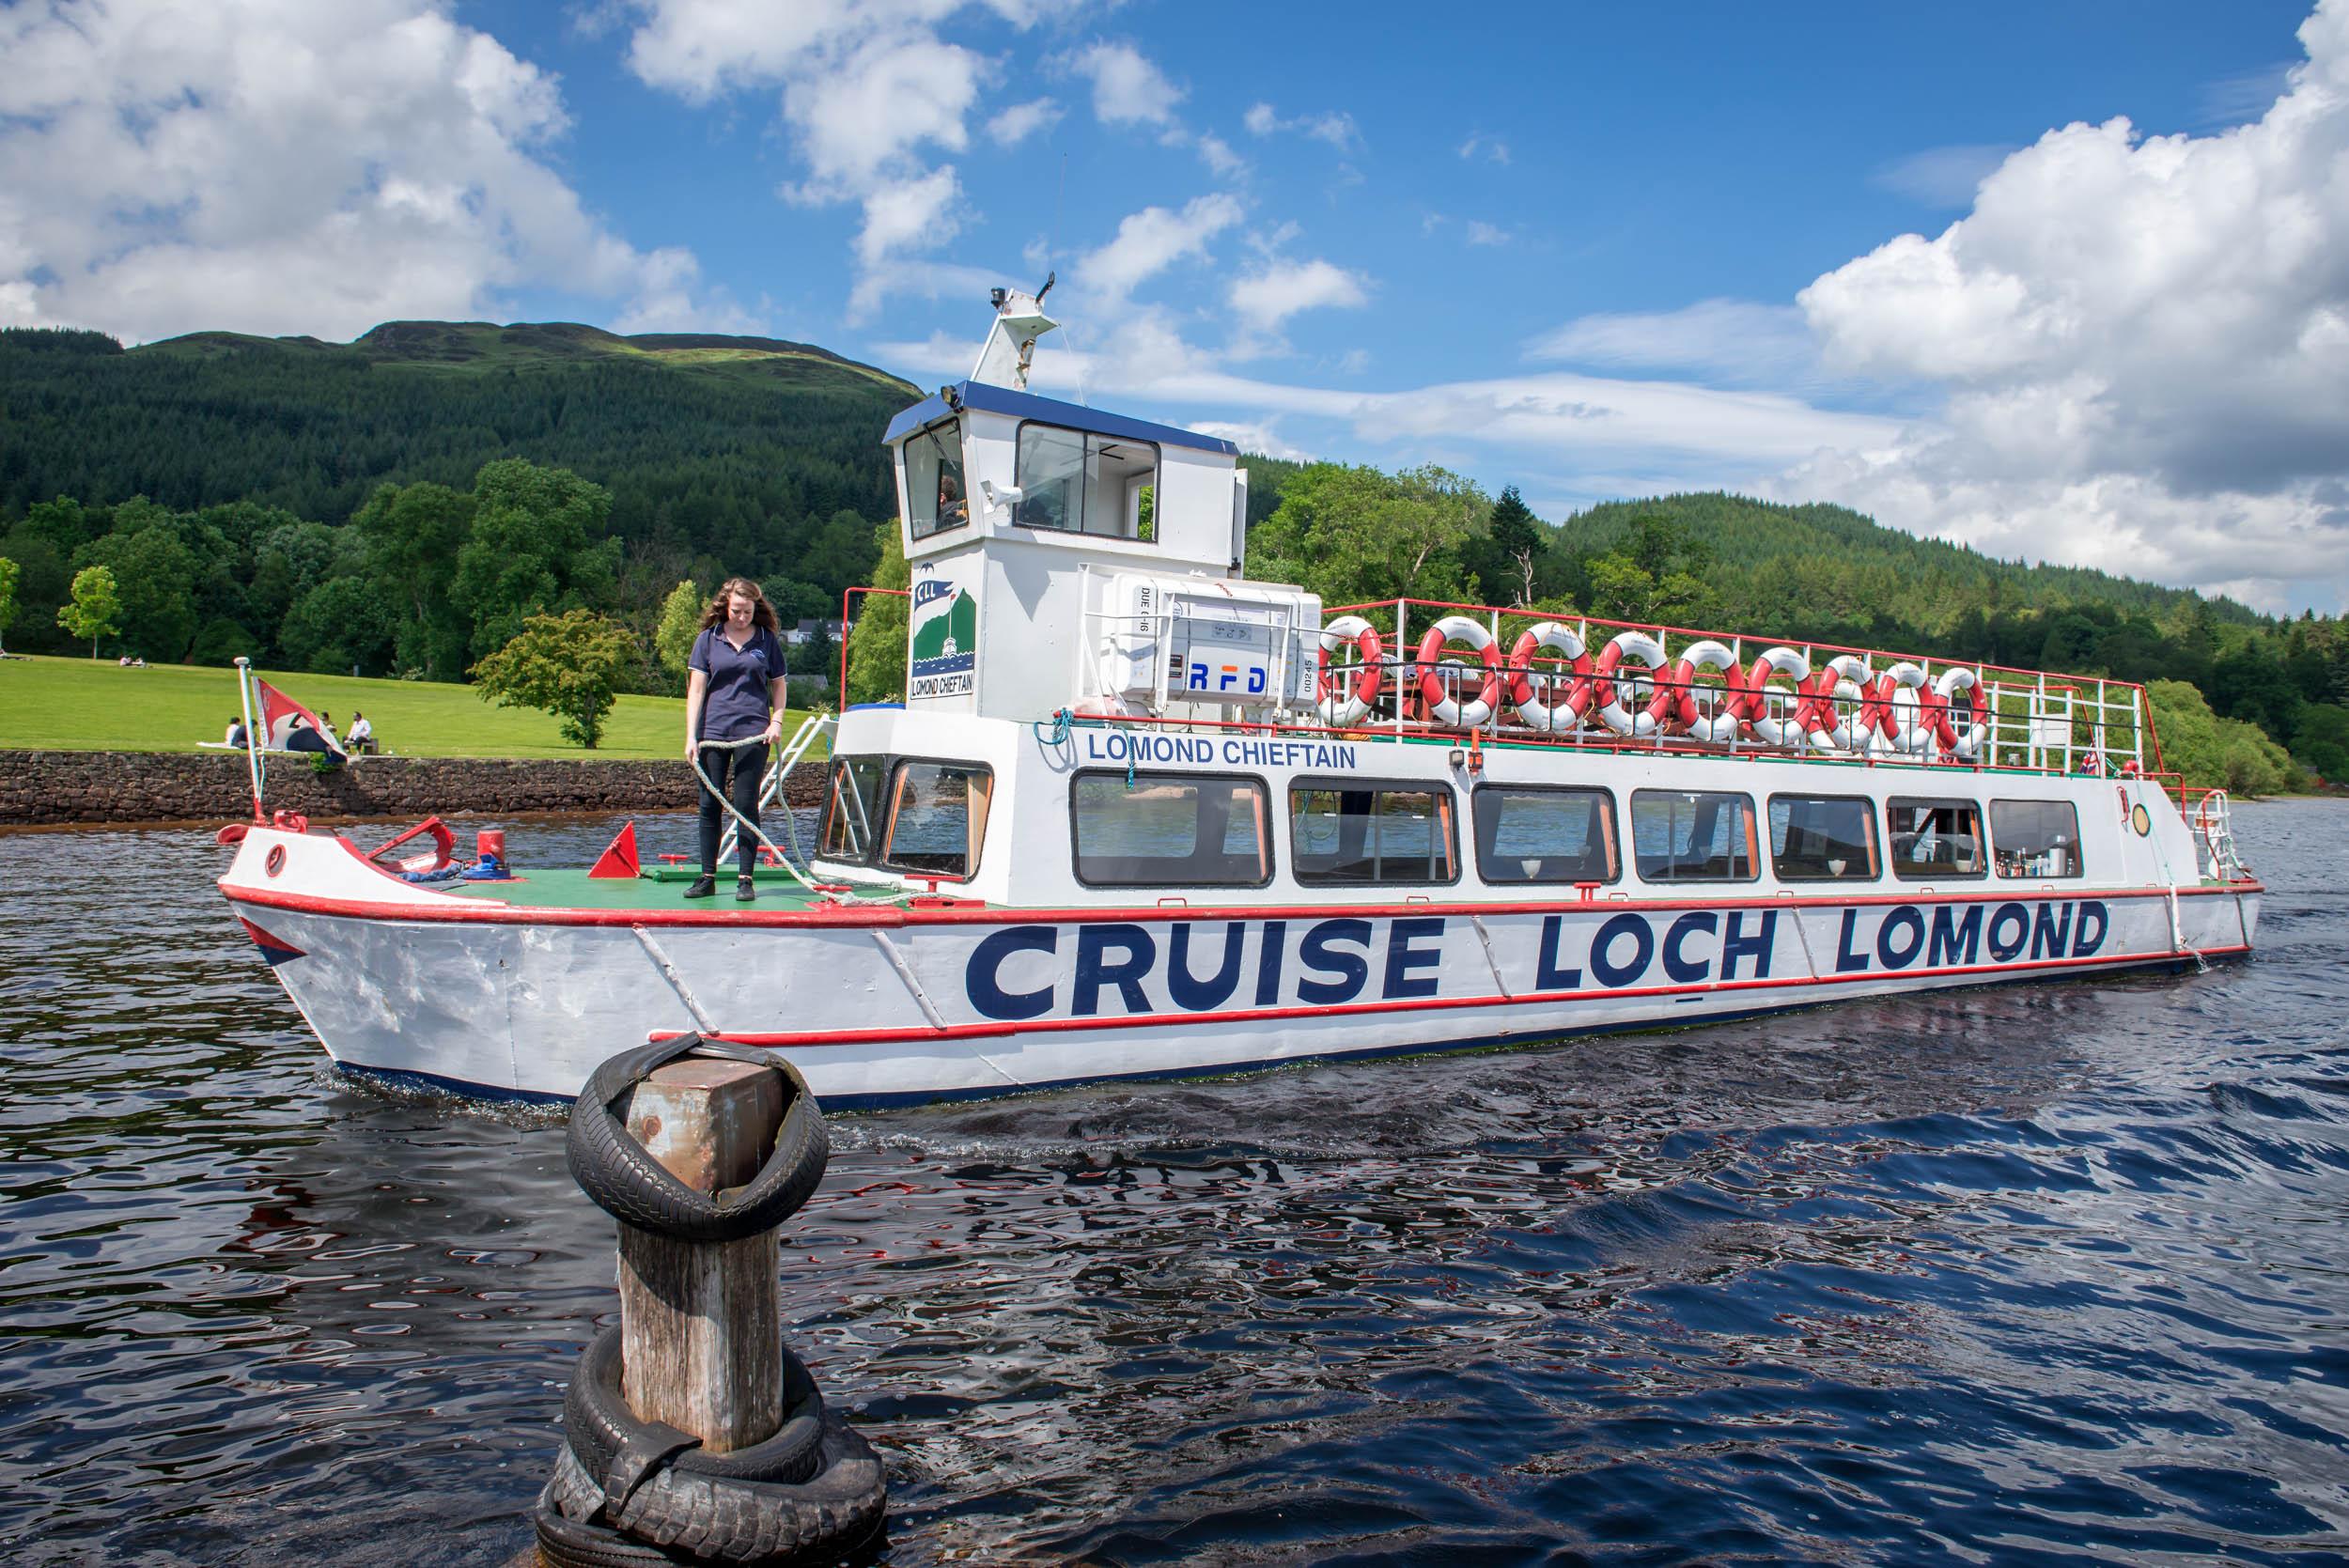 Cruise-Loch-Lomond-1222.jpg